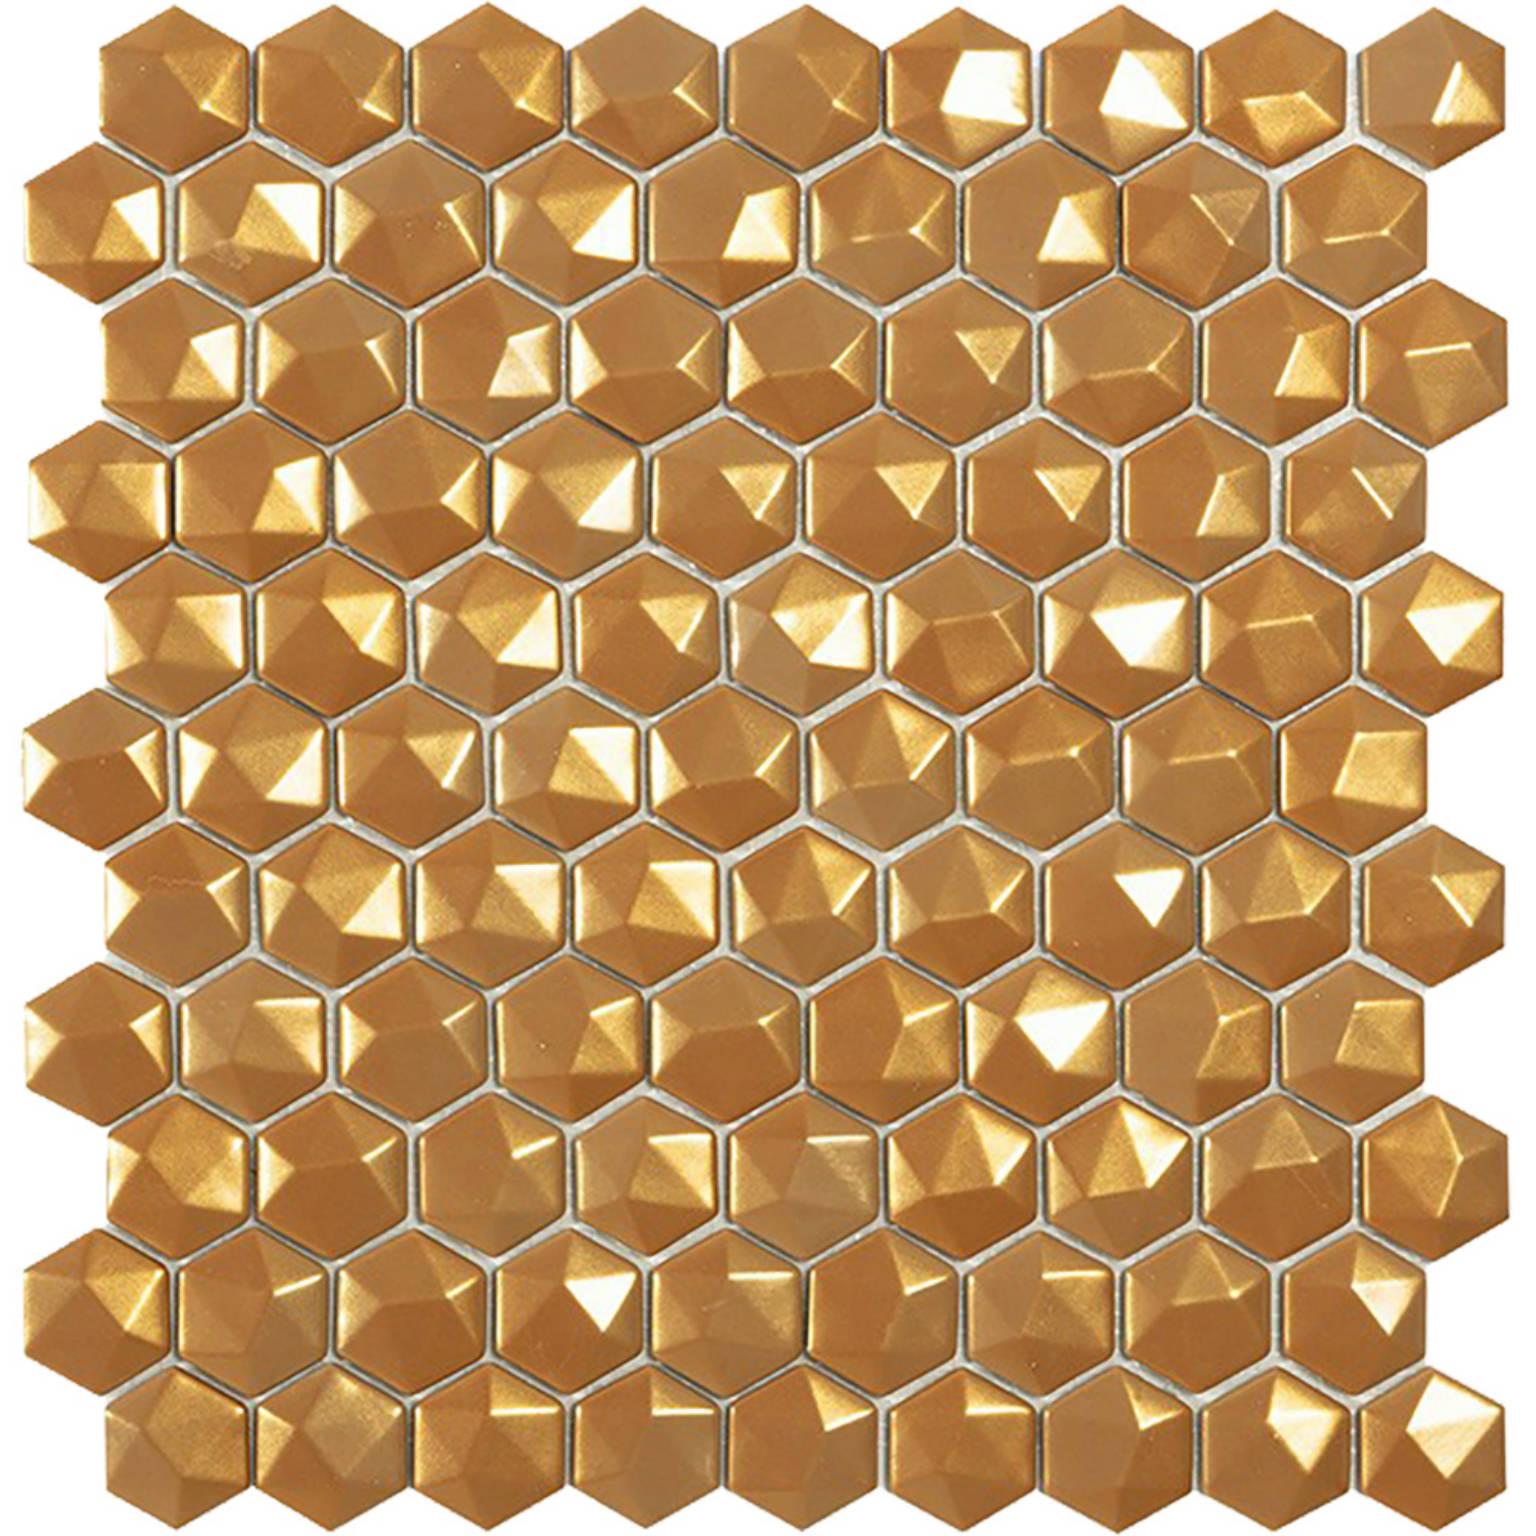 Mos Magic Gold Hex 49 D 3,5X3,5 | Prosein